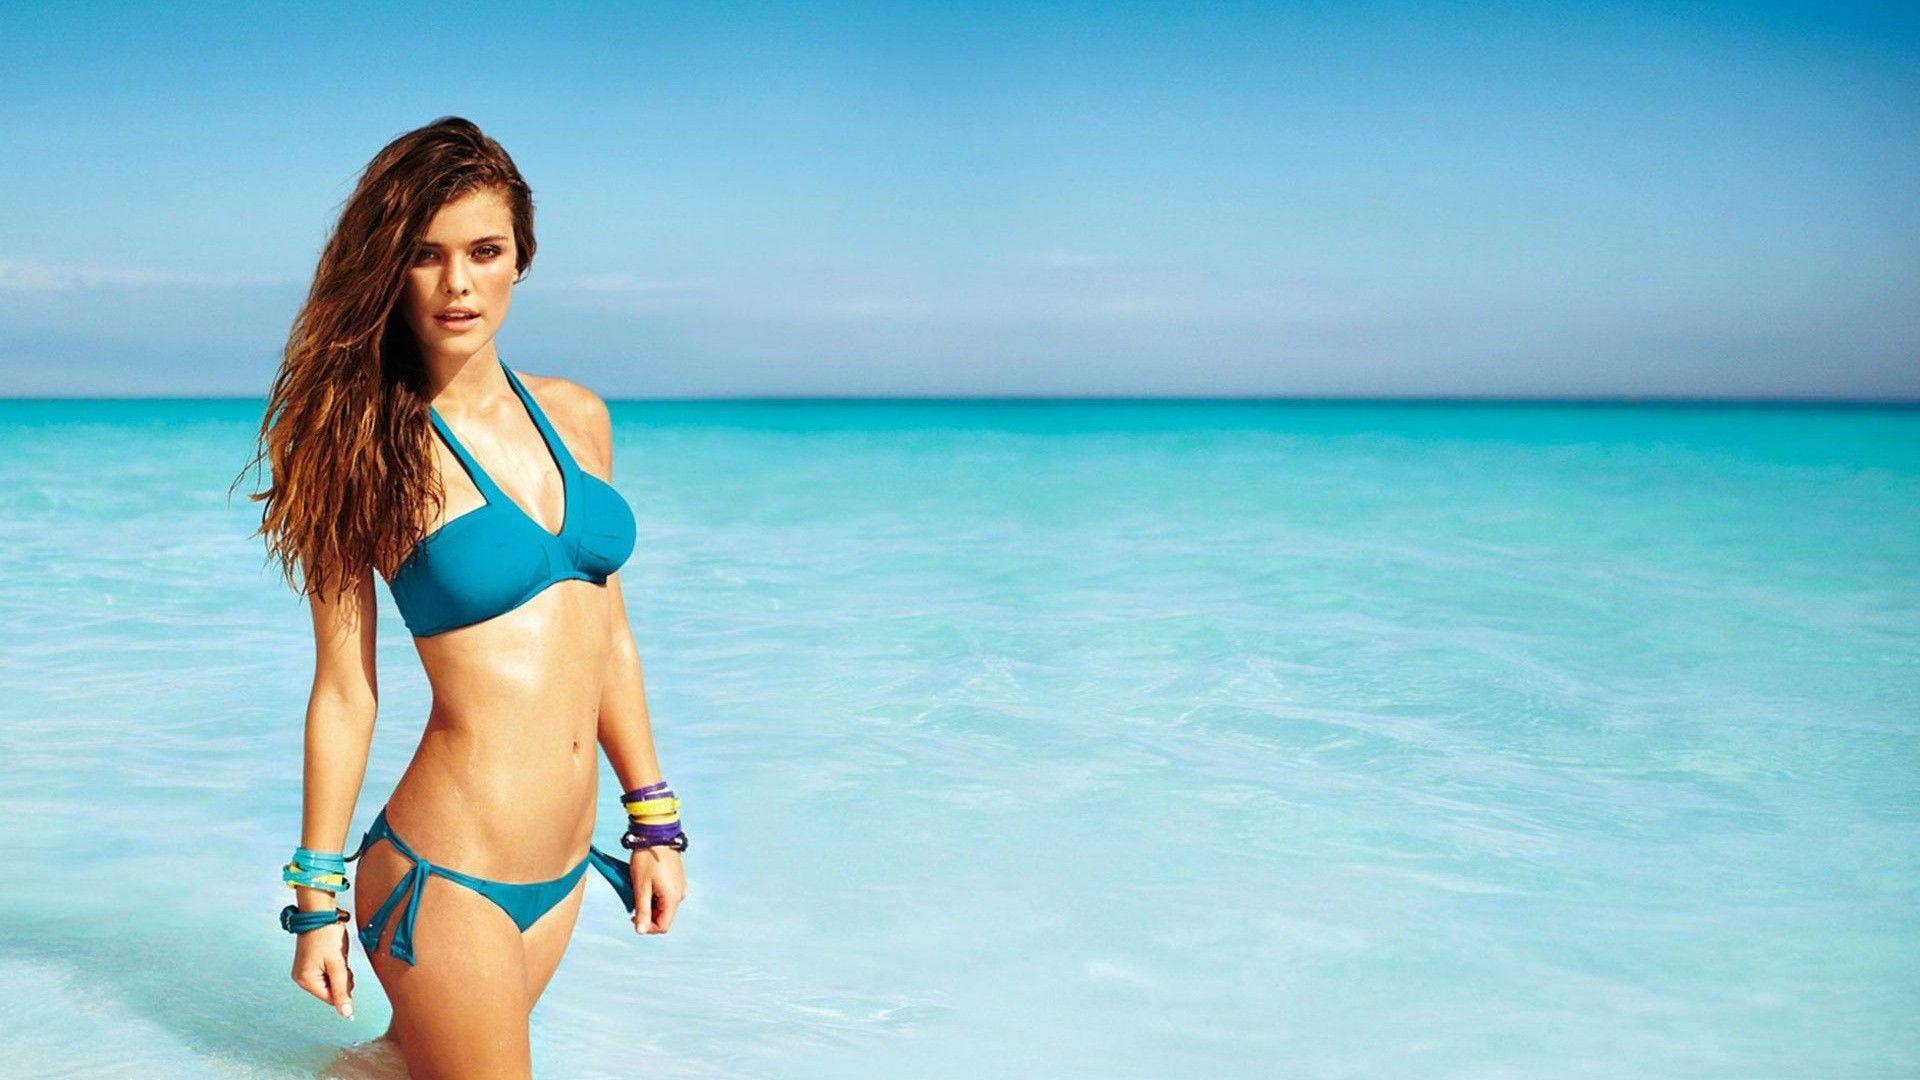 hot beach girl bikini background hd wallpaper